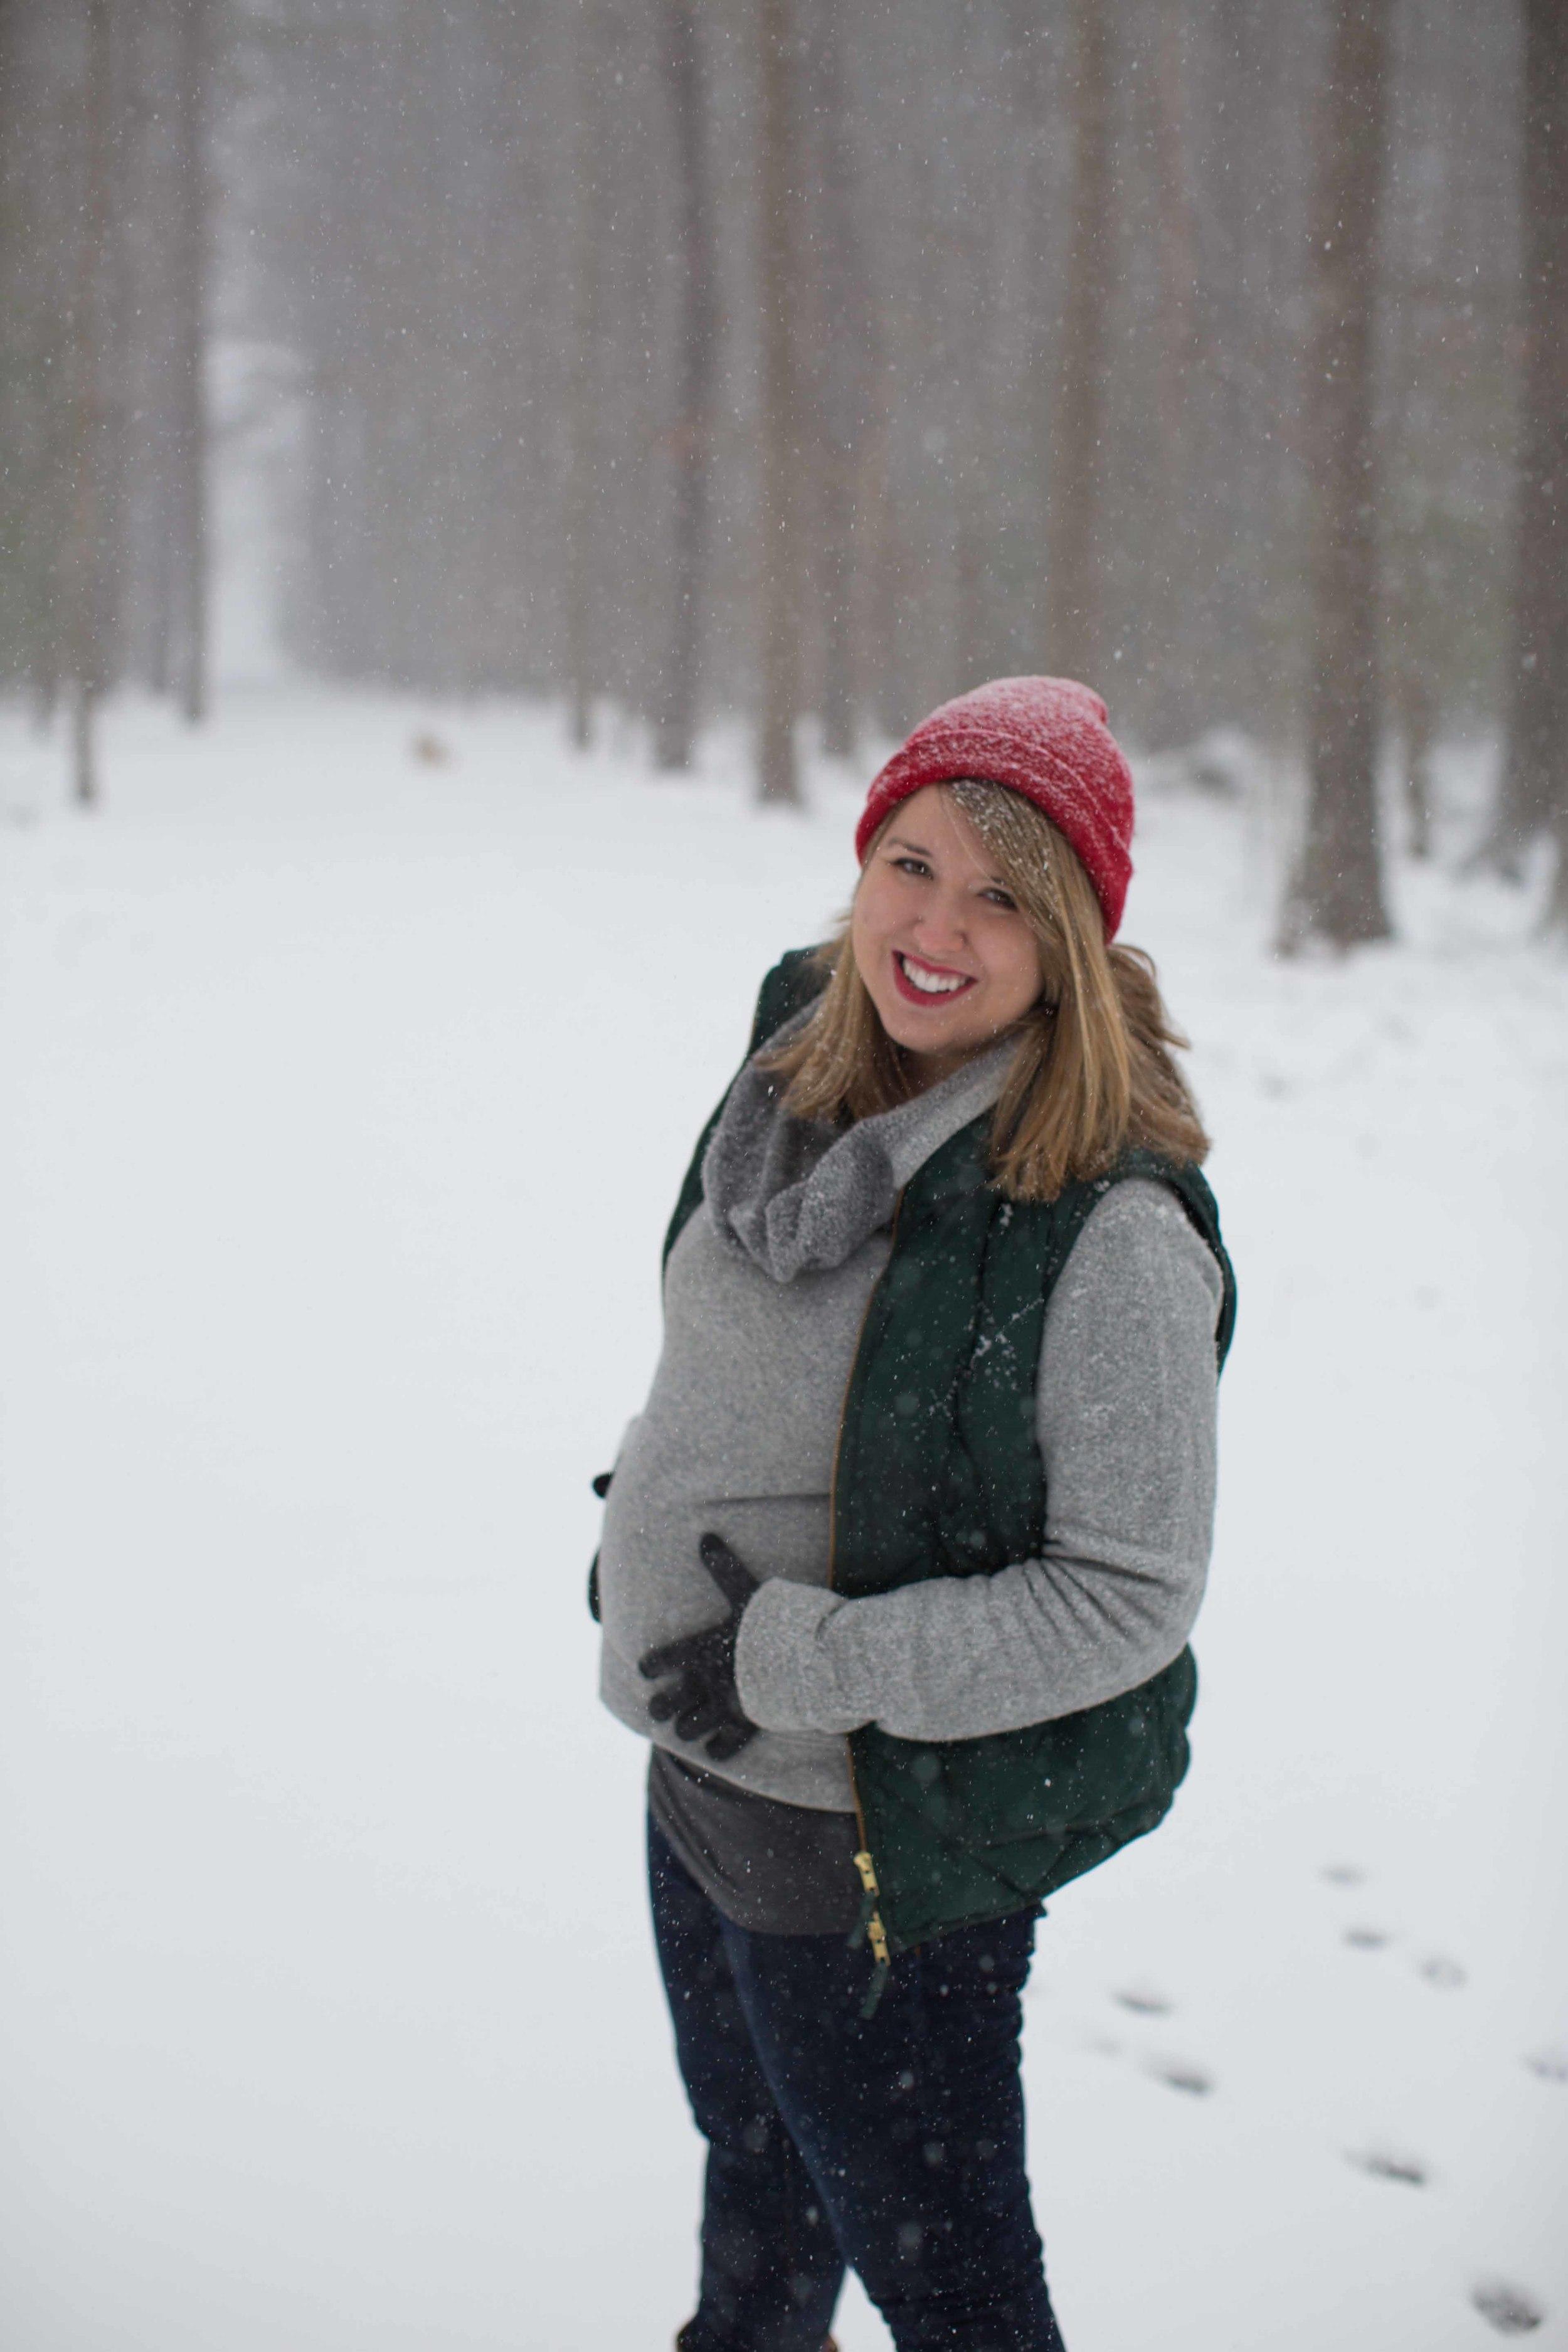 winter walk march 2014-019.jpg